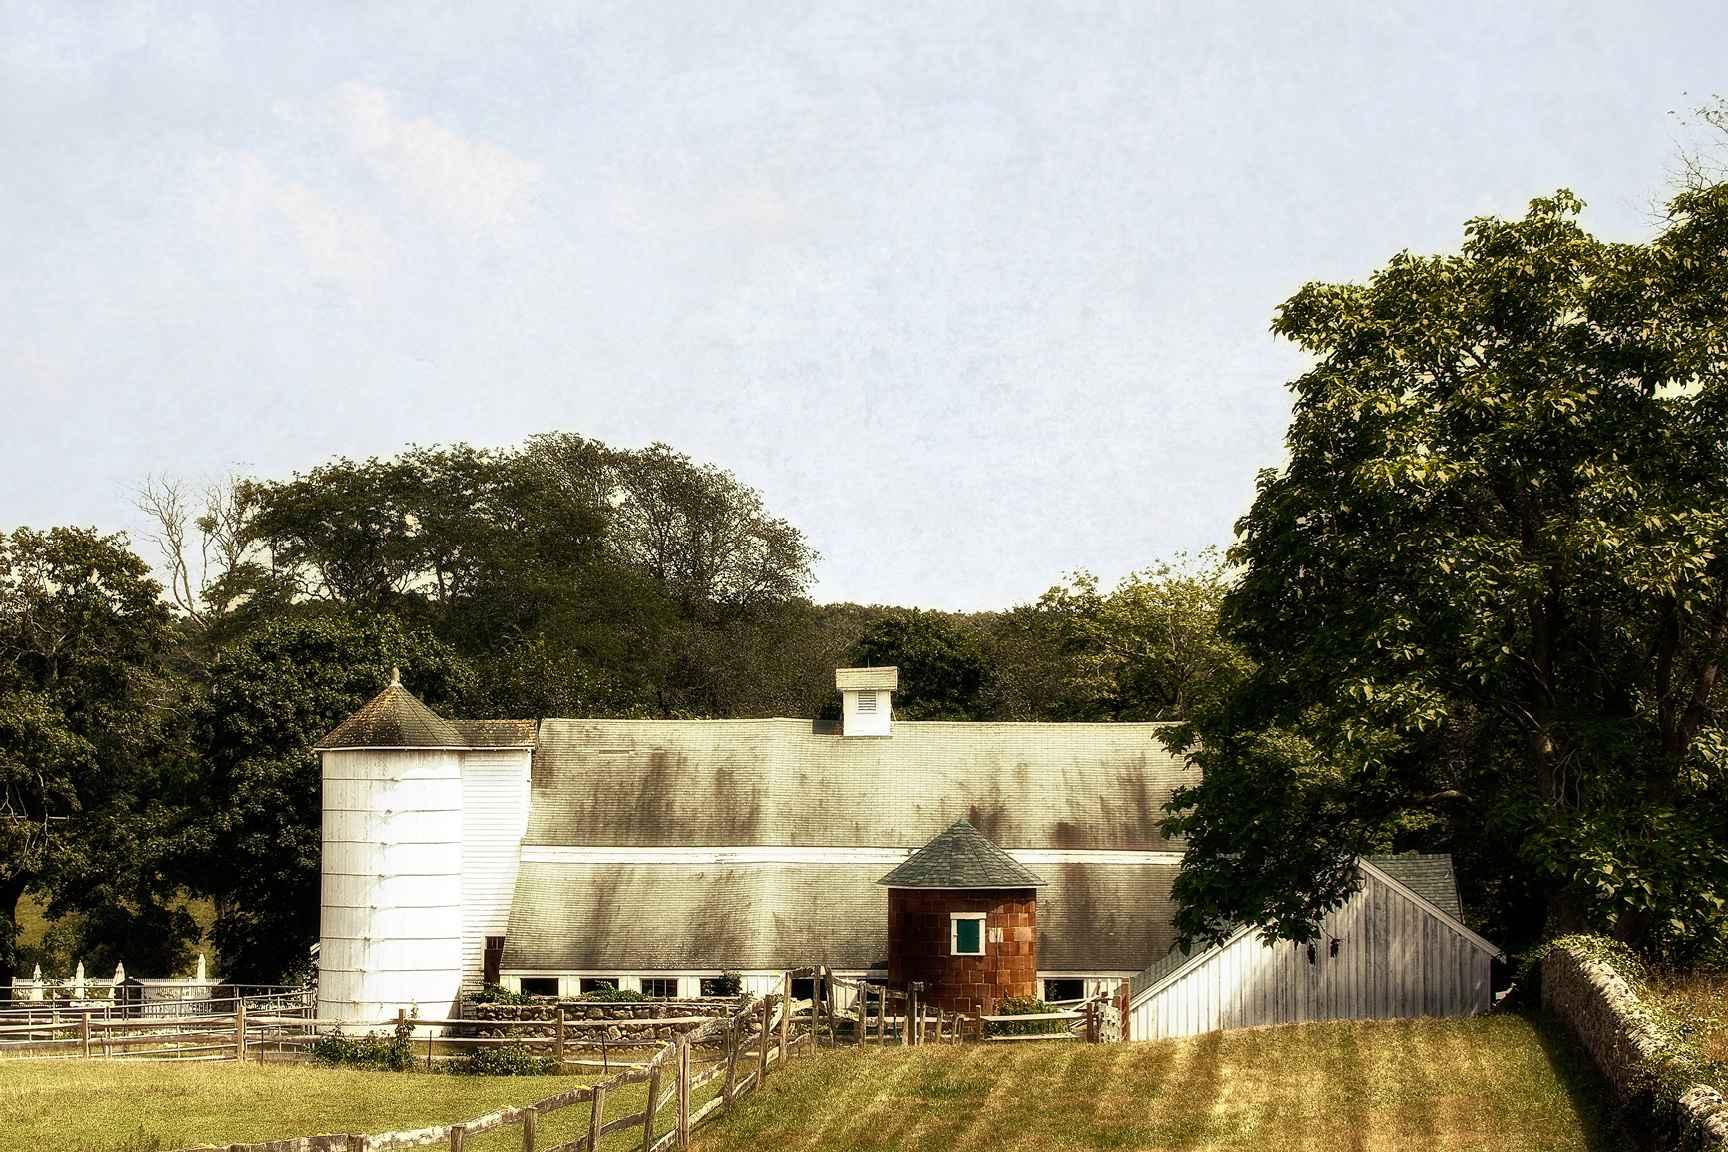 Summer Barn by  Michael Stimola - Masterpiece Online